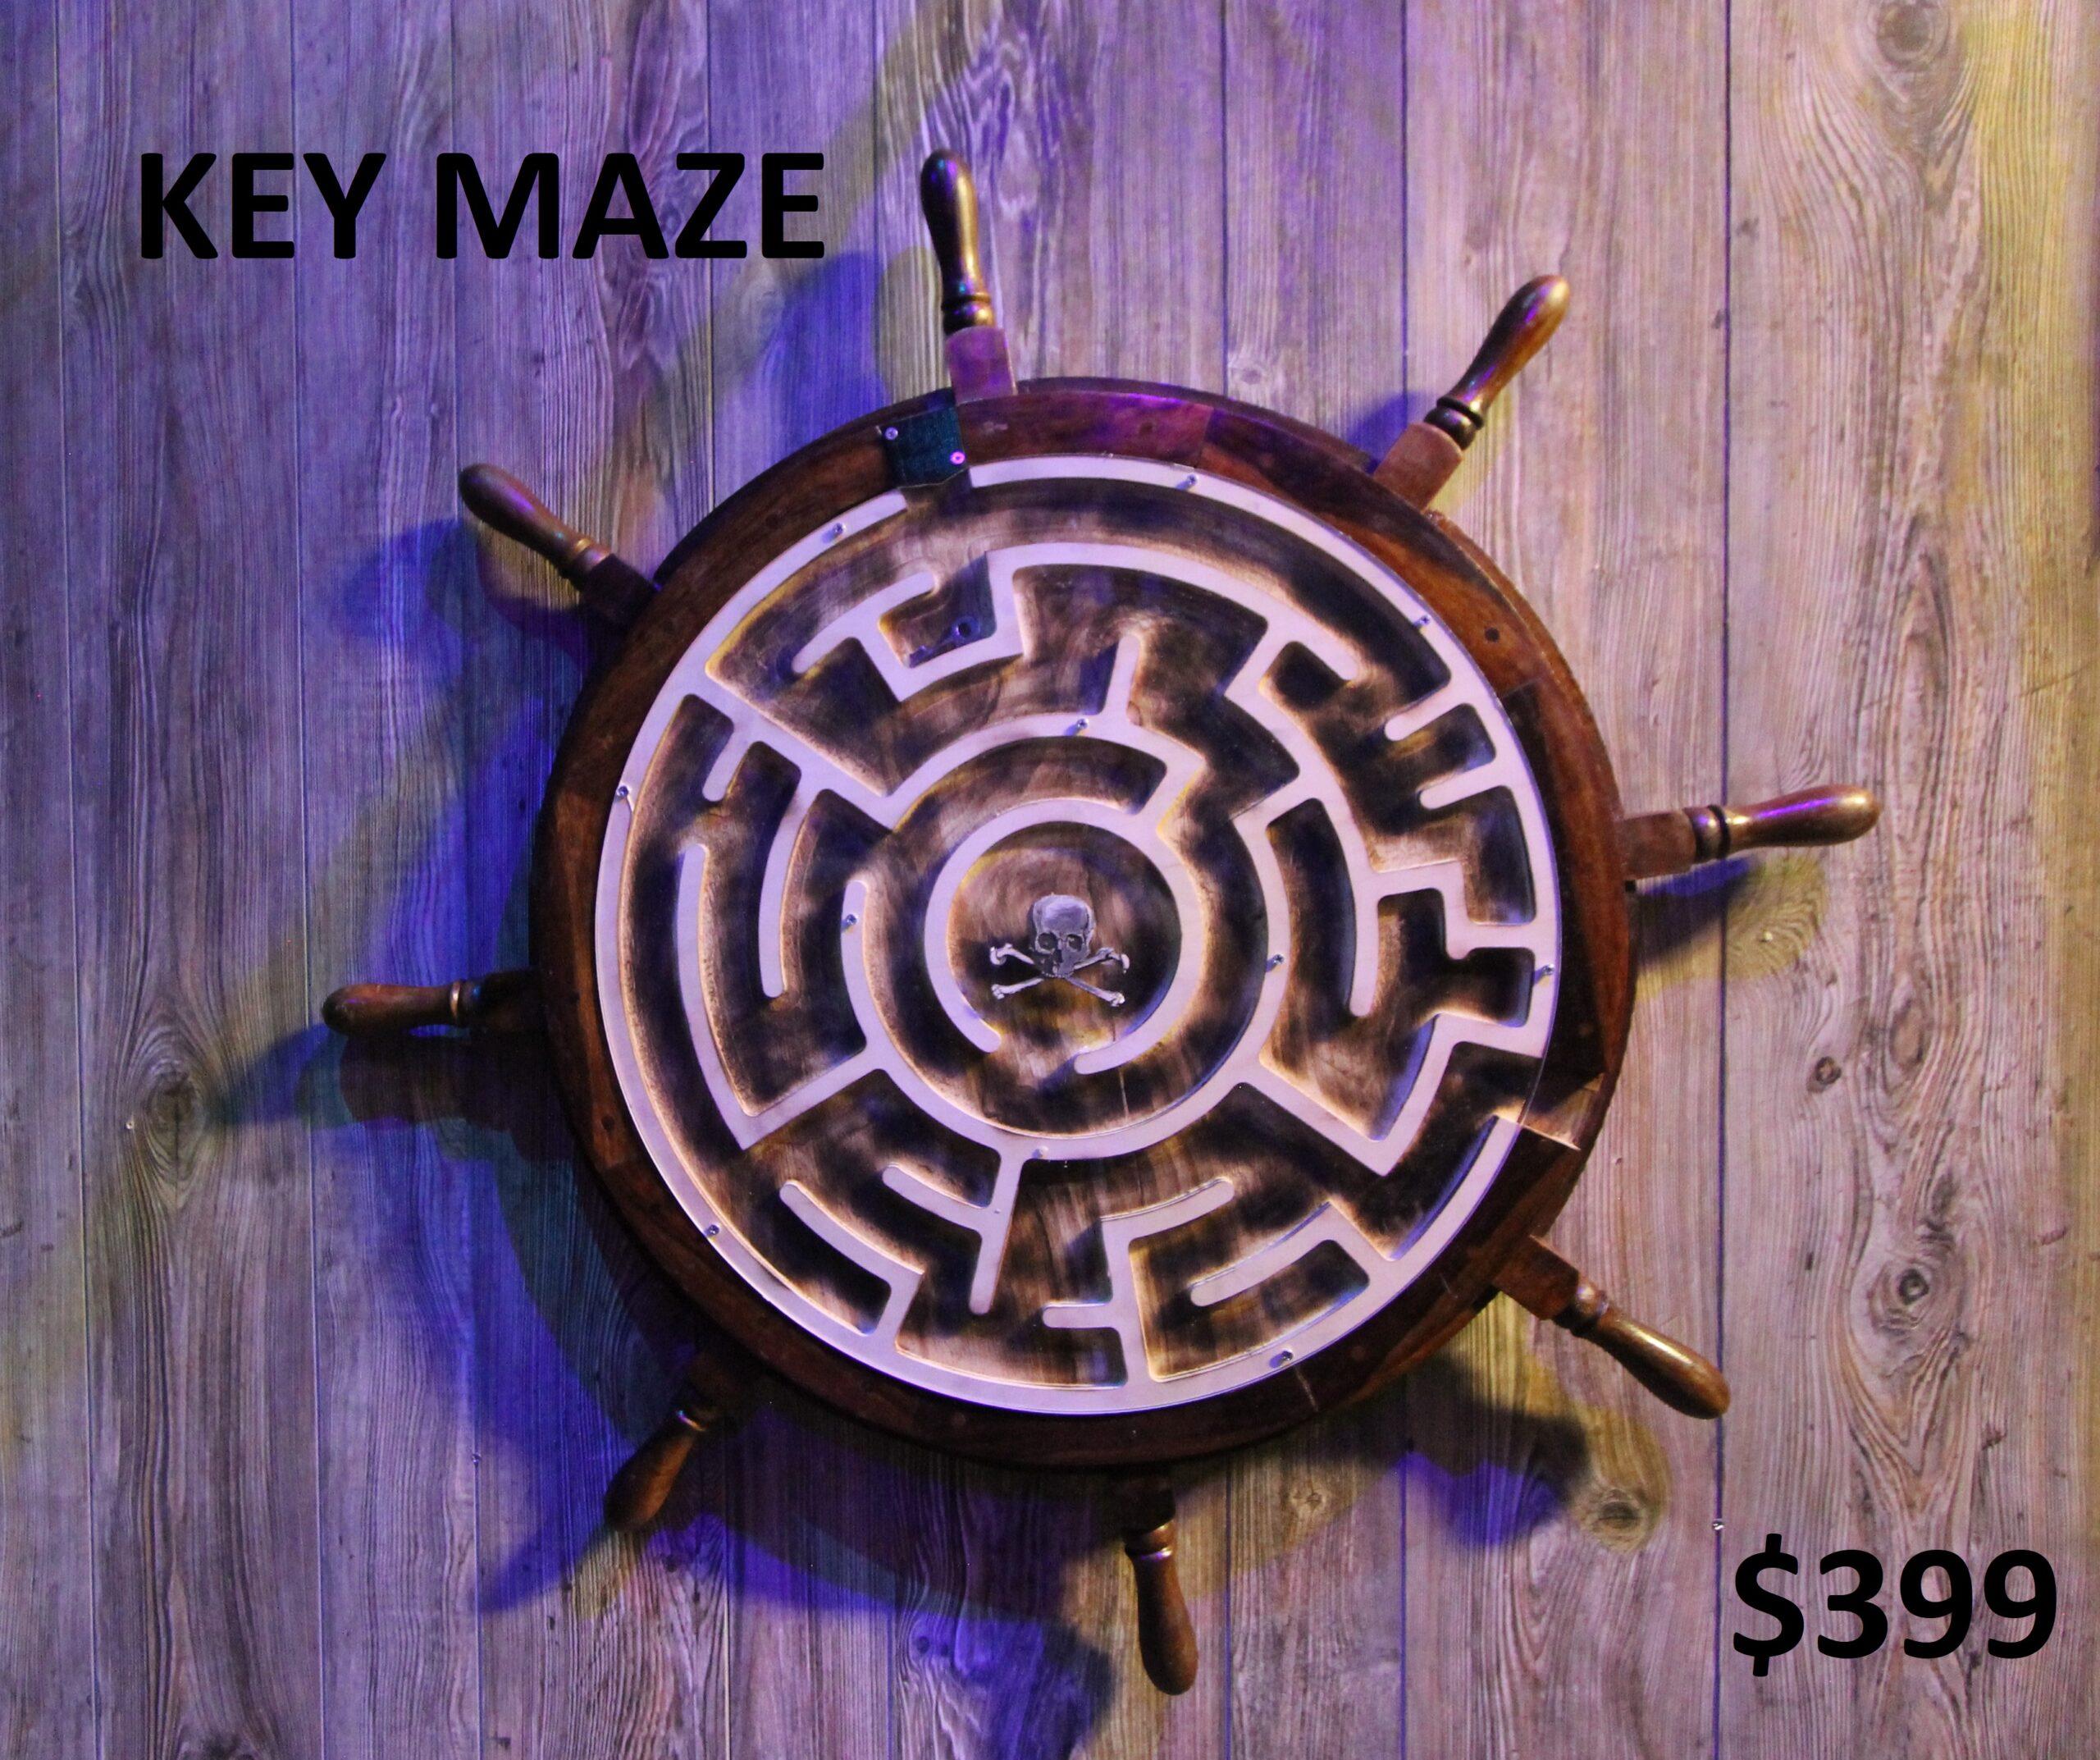 Ships Wheel Key Maze Image